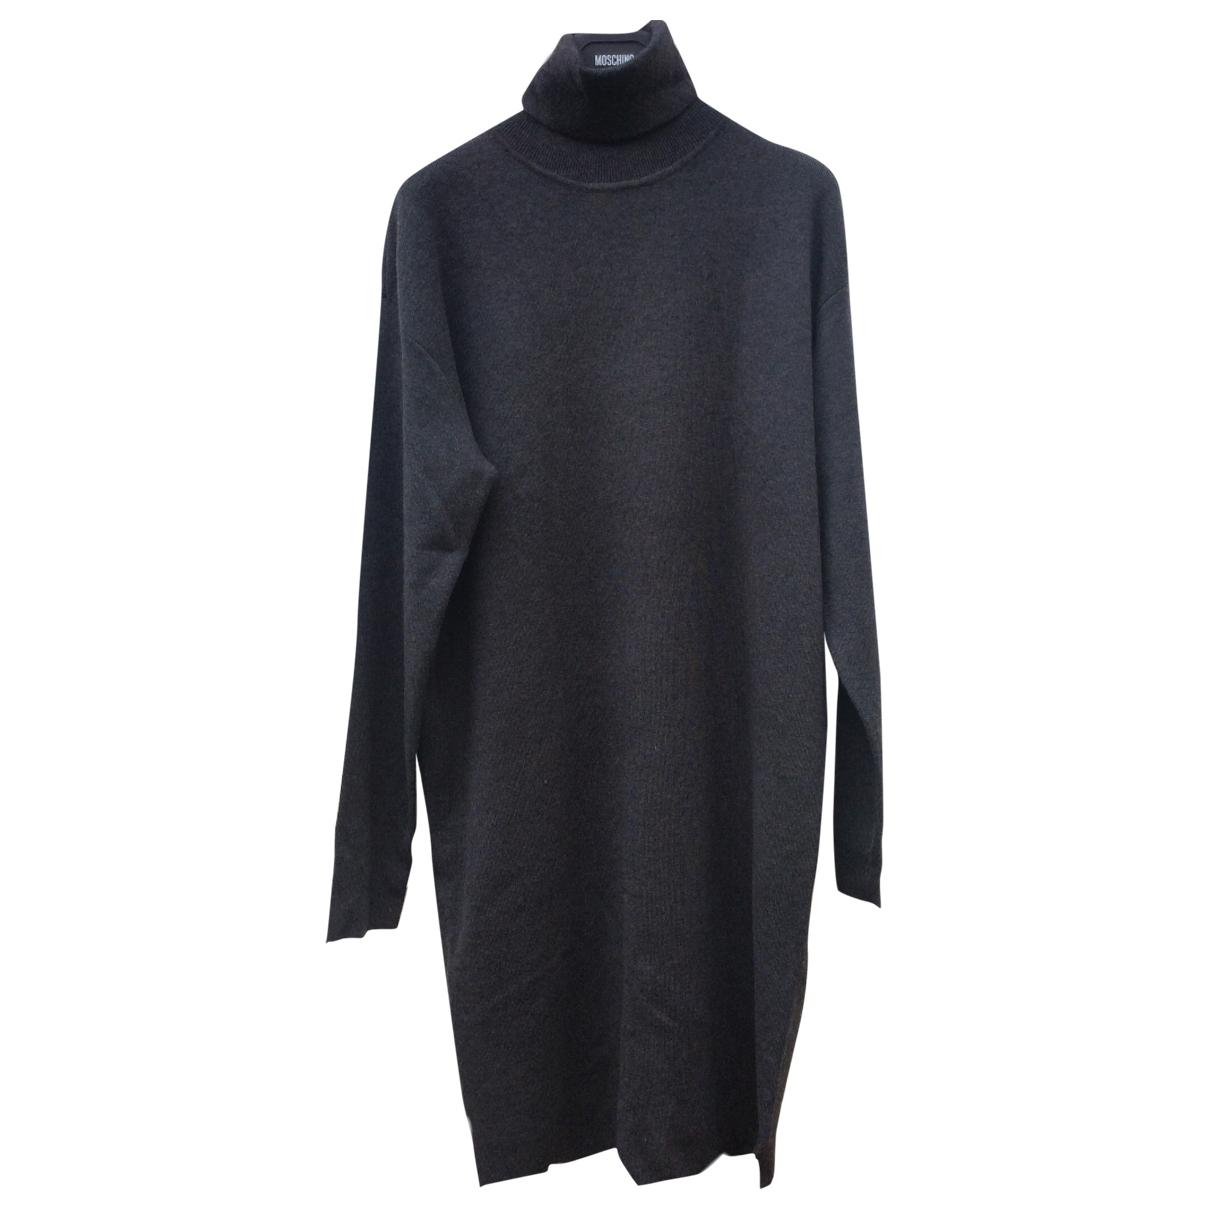 Michael Kors \N Grey Cashmere Knitwear for Women M International